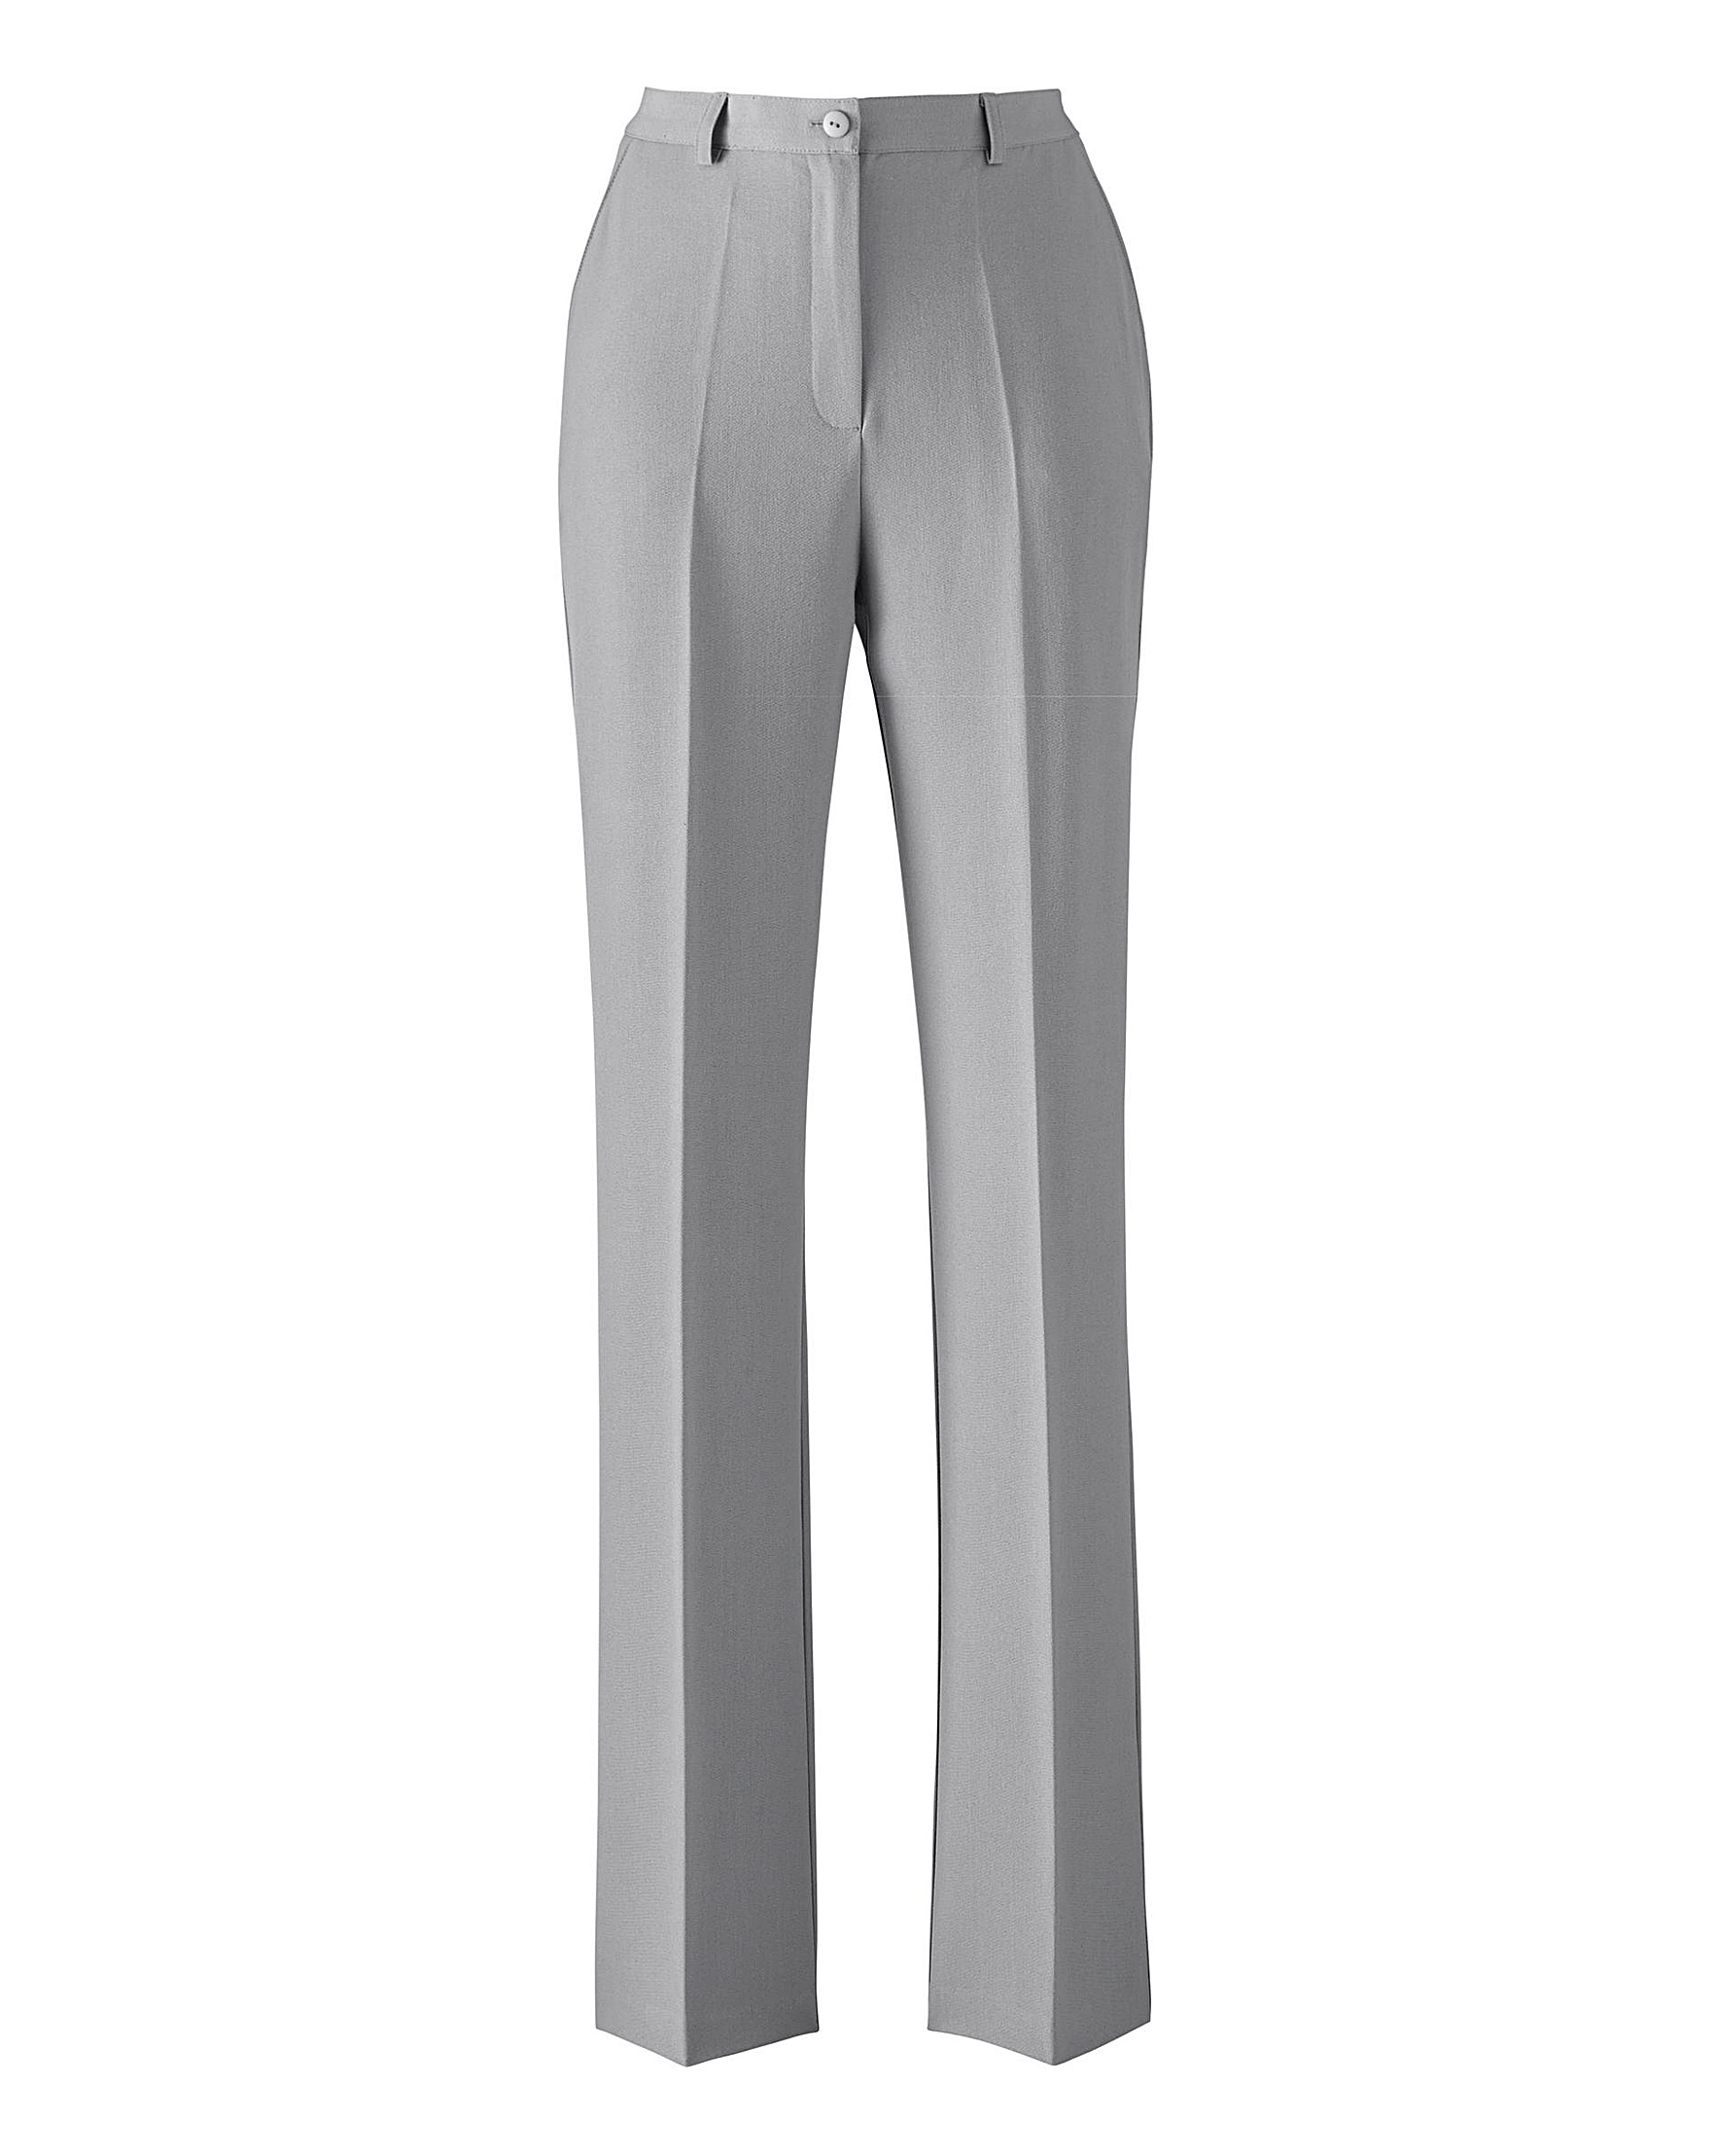 21cb895a672 Slimma Classic-Leg Trousers Extra Short